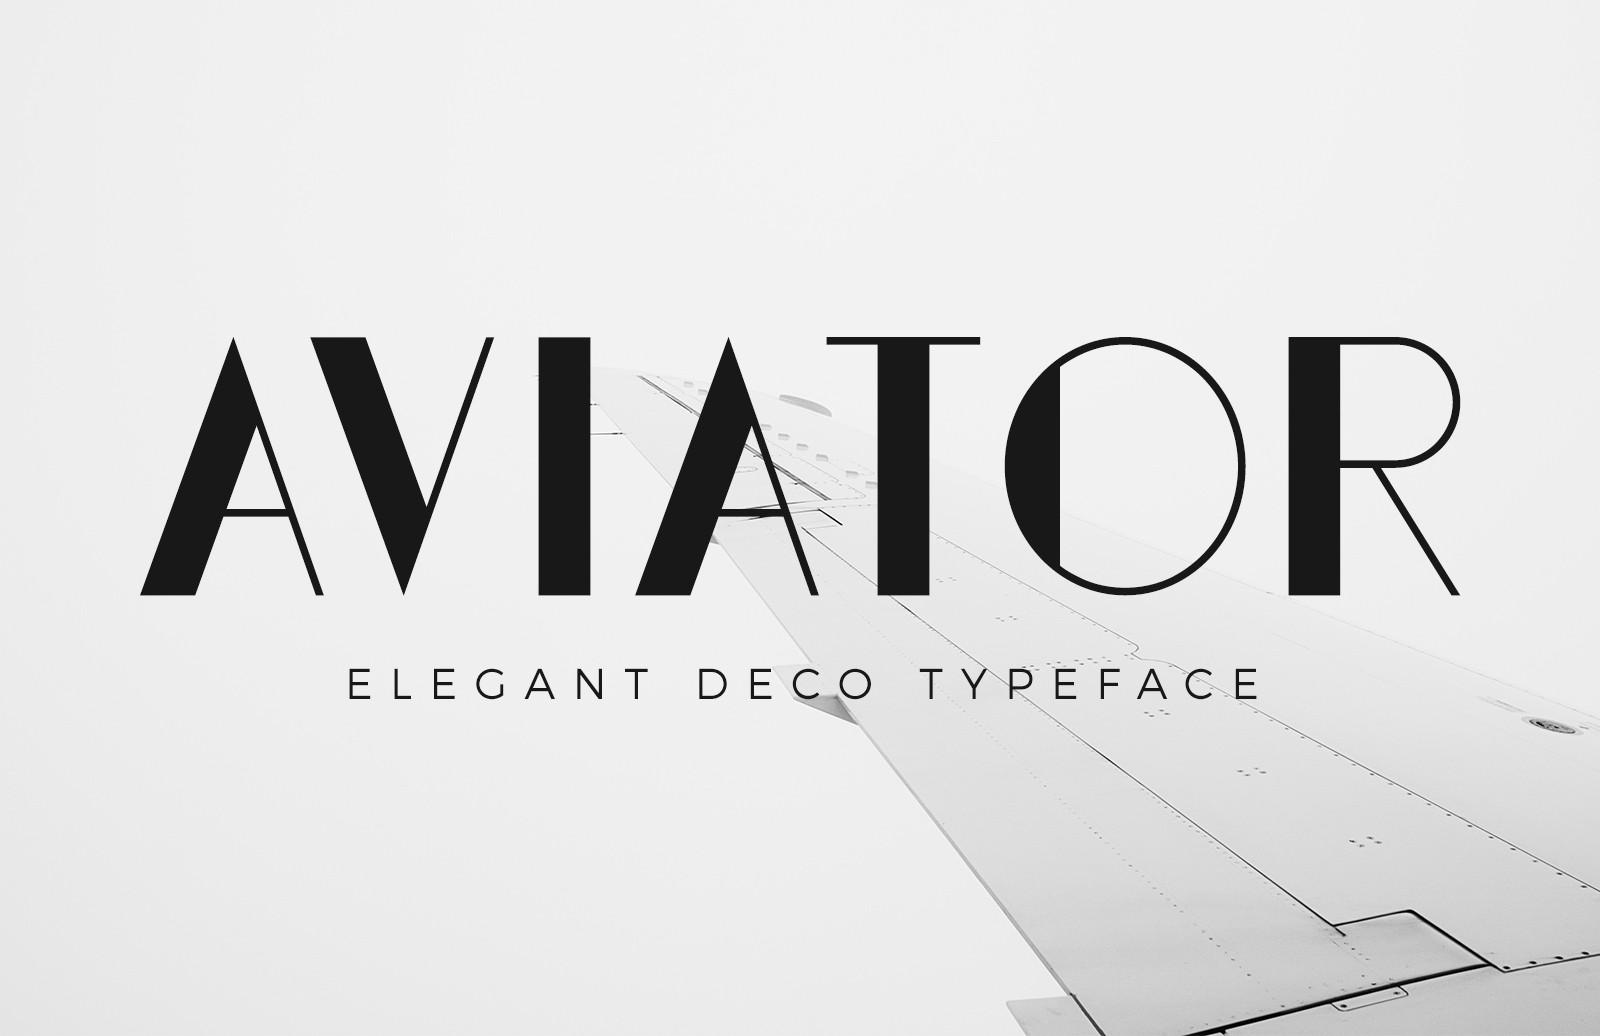 Aviator创意简洁极细logo英文字体下载